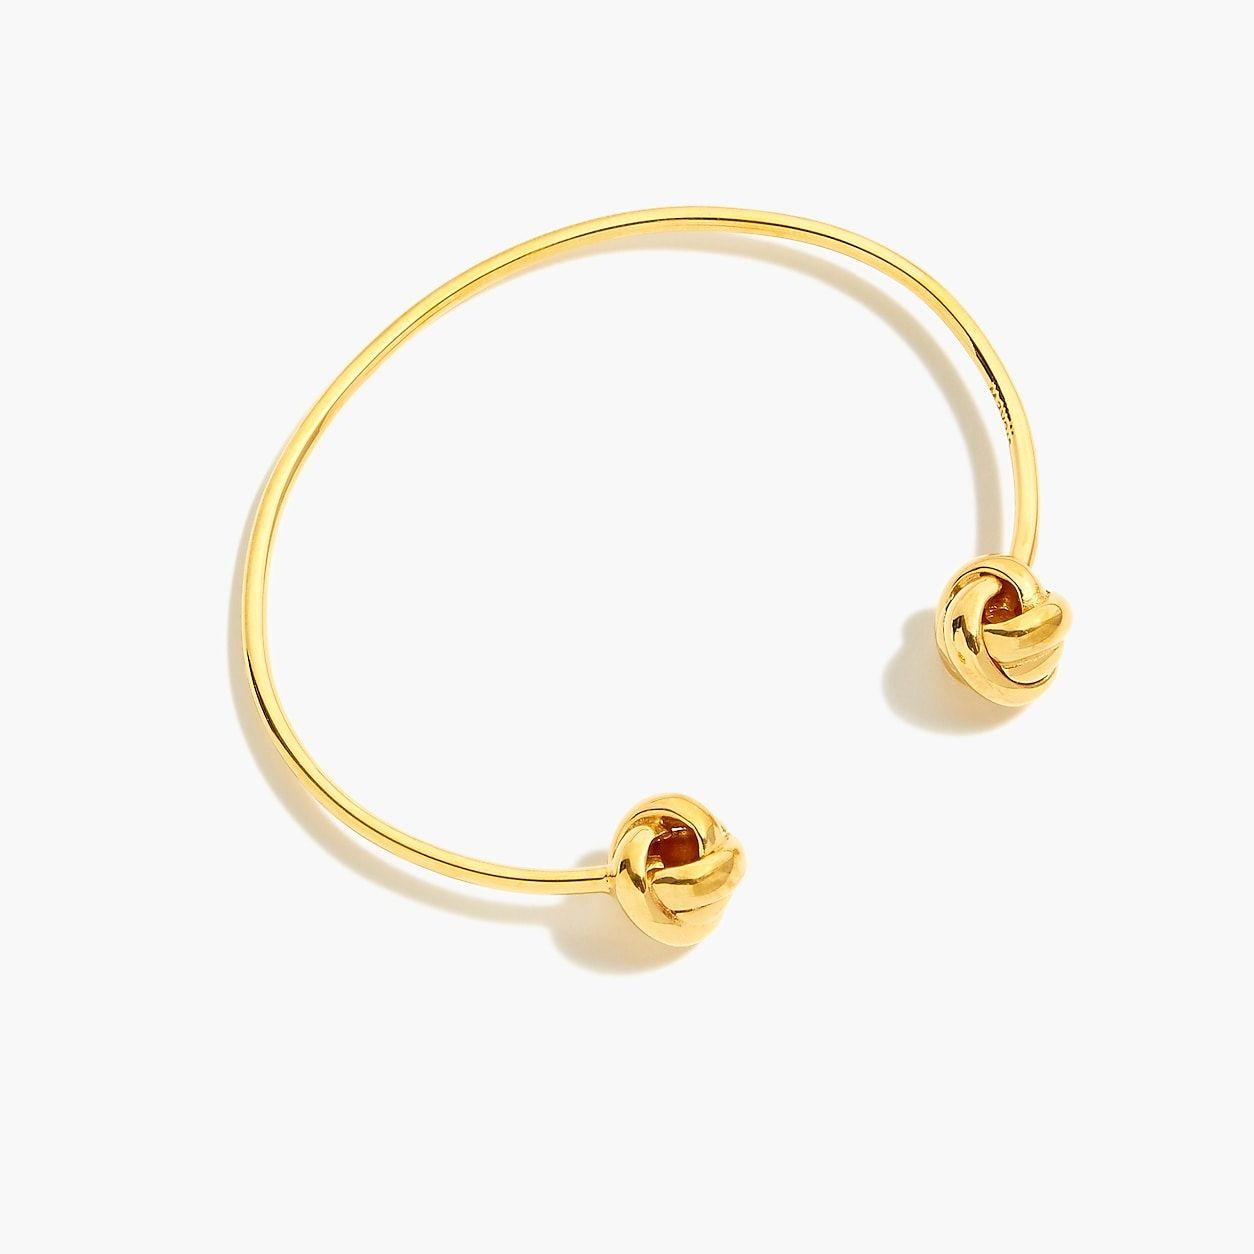 faeb2c07eb0 Demi-Fine 14K Gold-Plated Knot Cuff in 2019 | Products | Jewelry ...